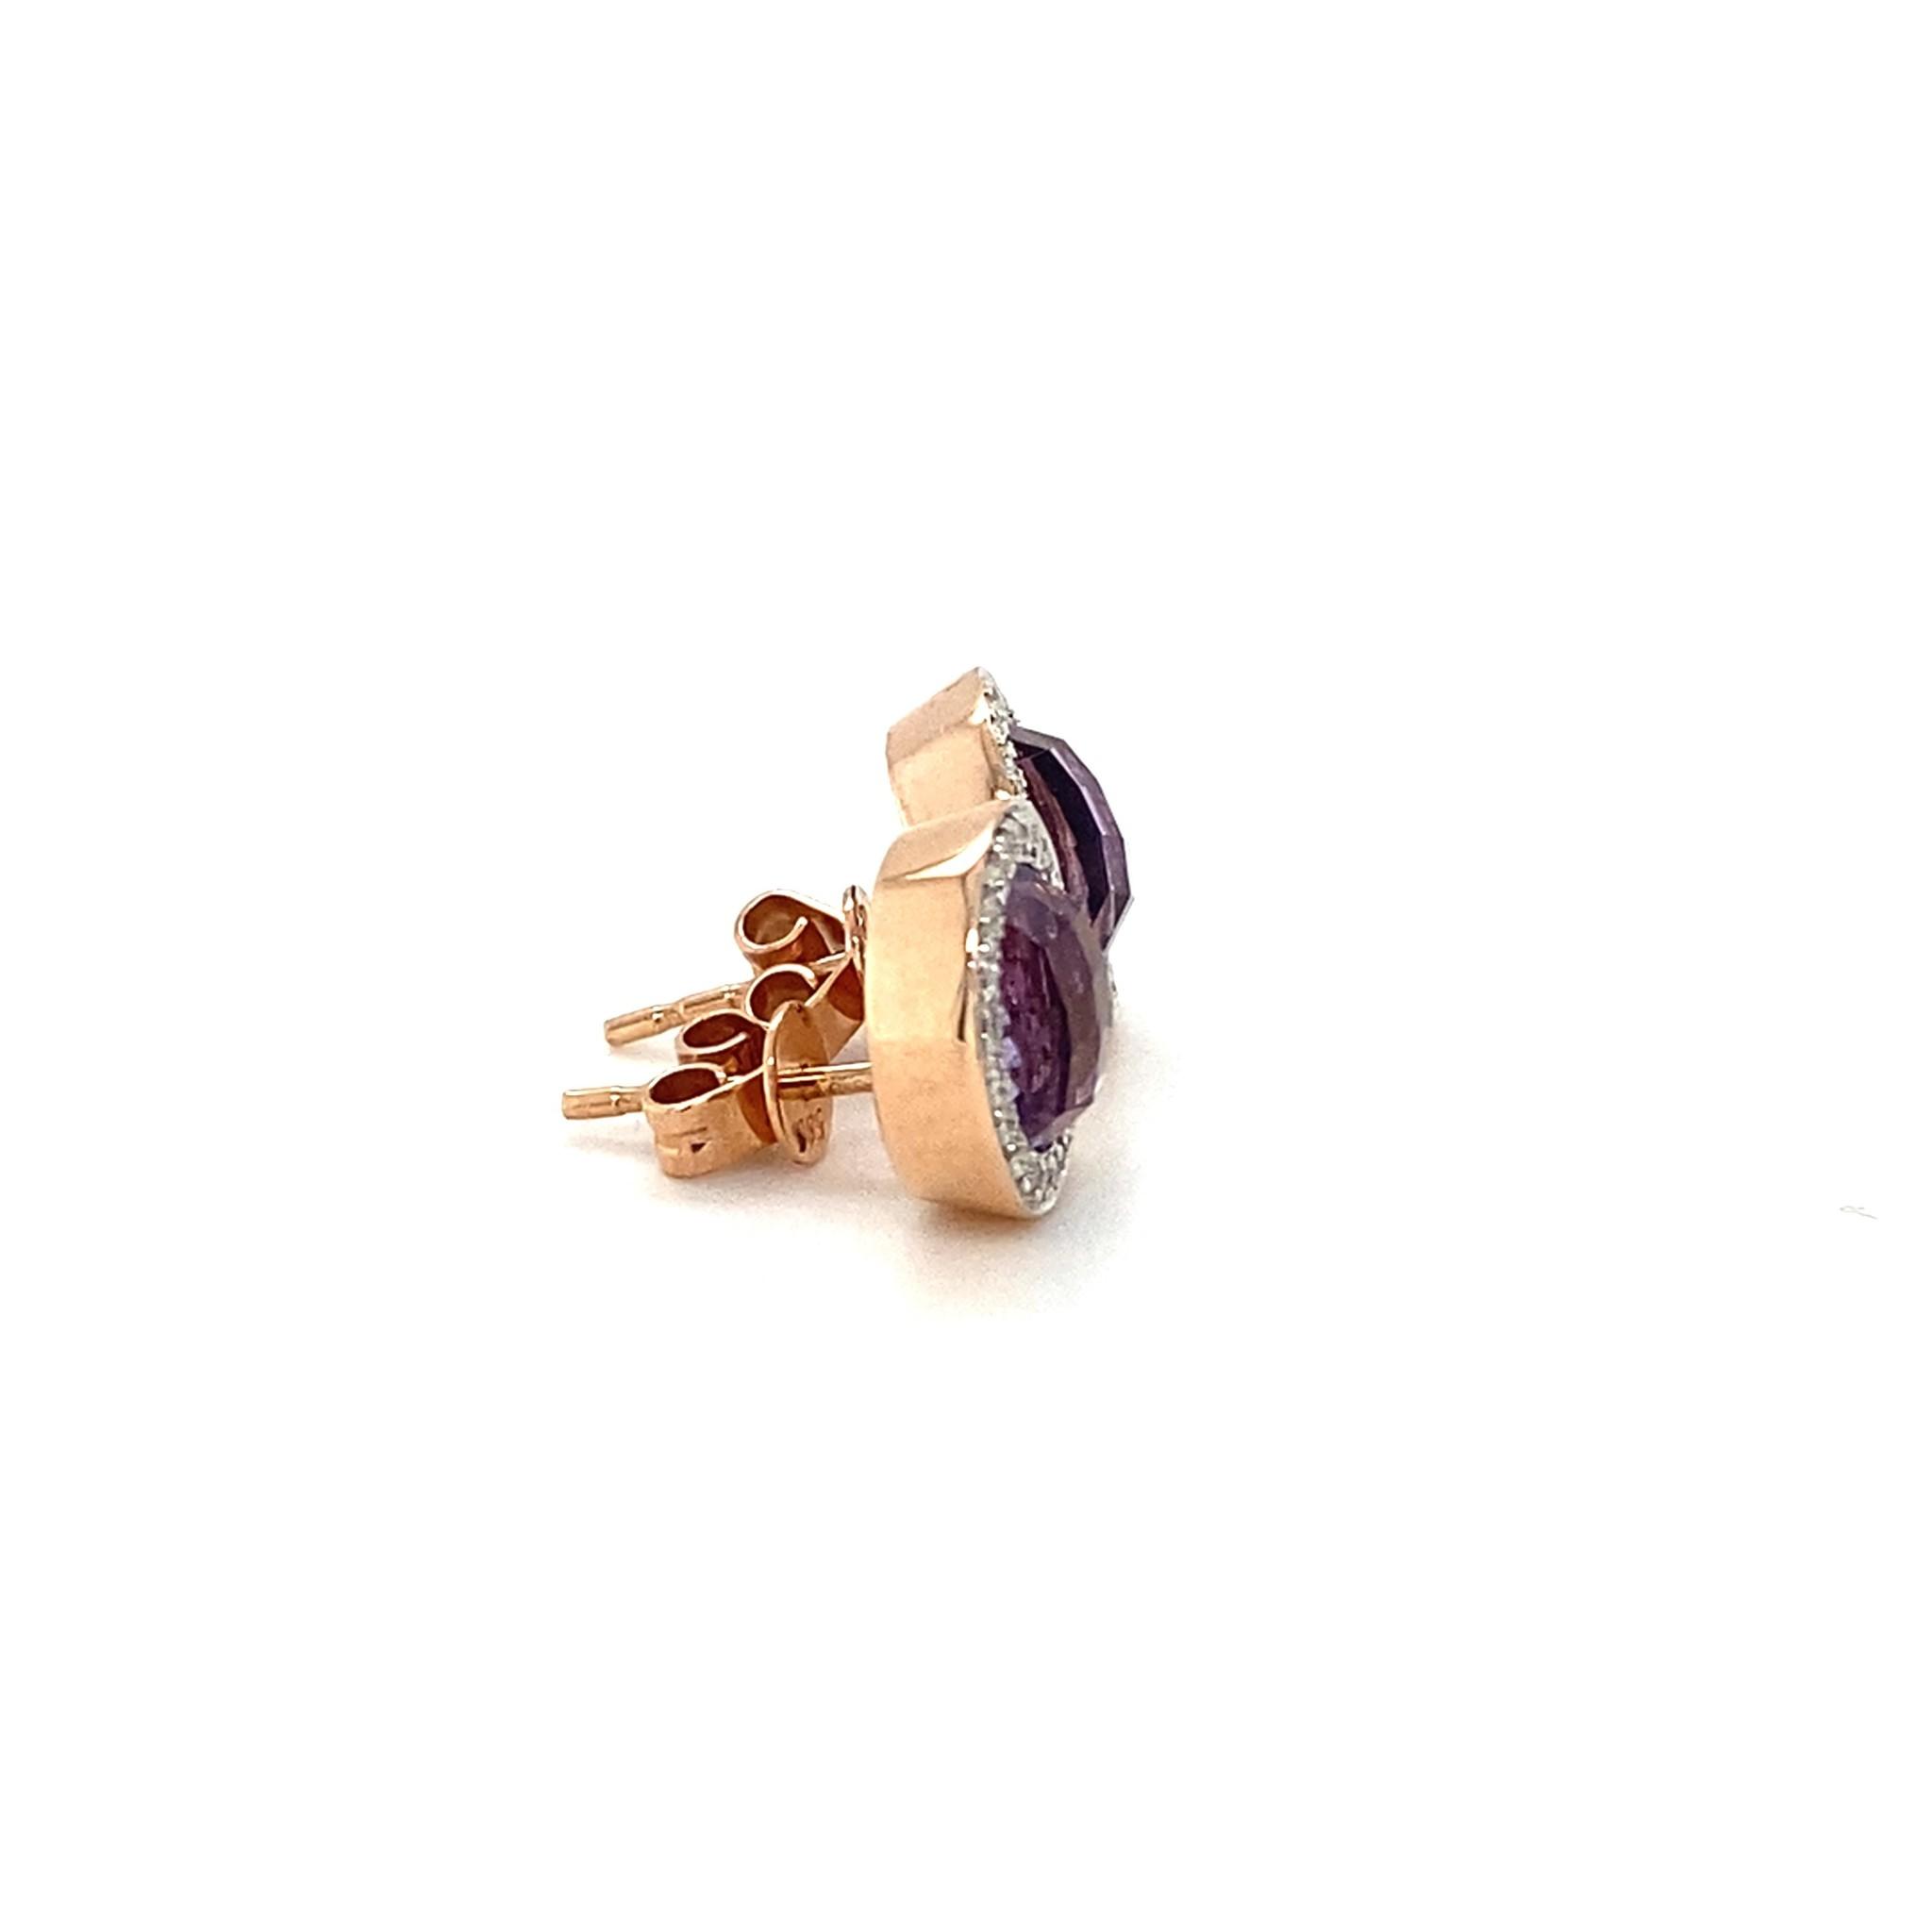 Passione Tomylo 14K rosegouden oorknoppen met dome geslepen amethyst 4,44ct en 0.17ct briljant Hsi